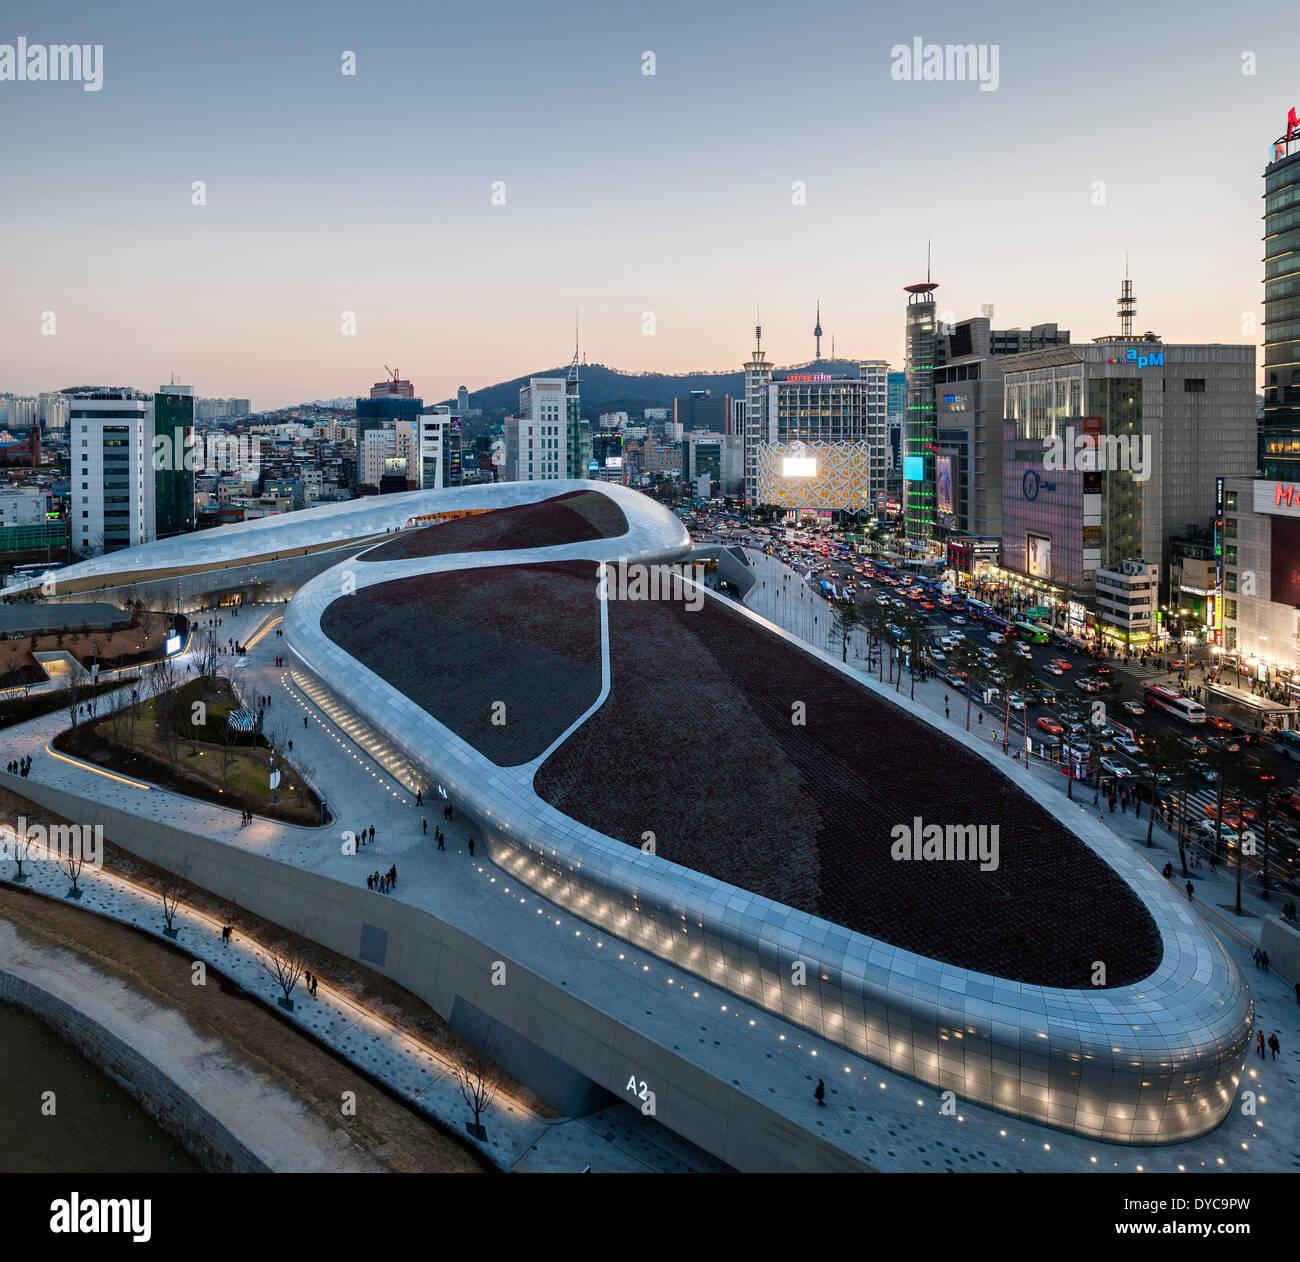 Dongdaemun design plaza ddp seoul s dkorea architekt zaha hadid architects 2014 - Vogelperspektive englisch ...